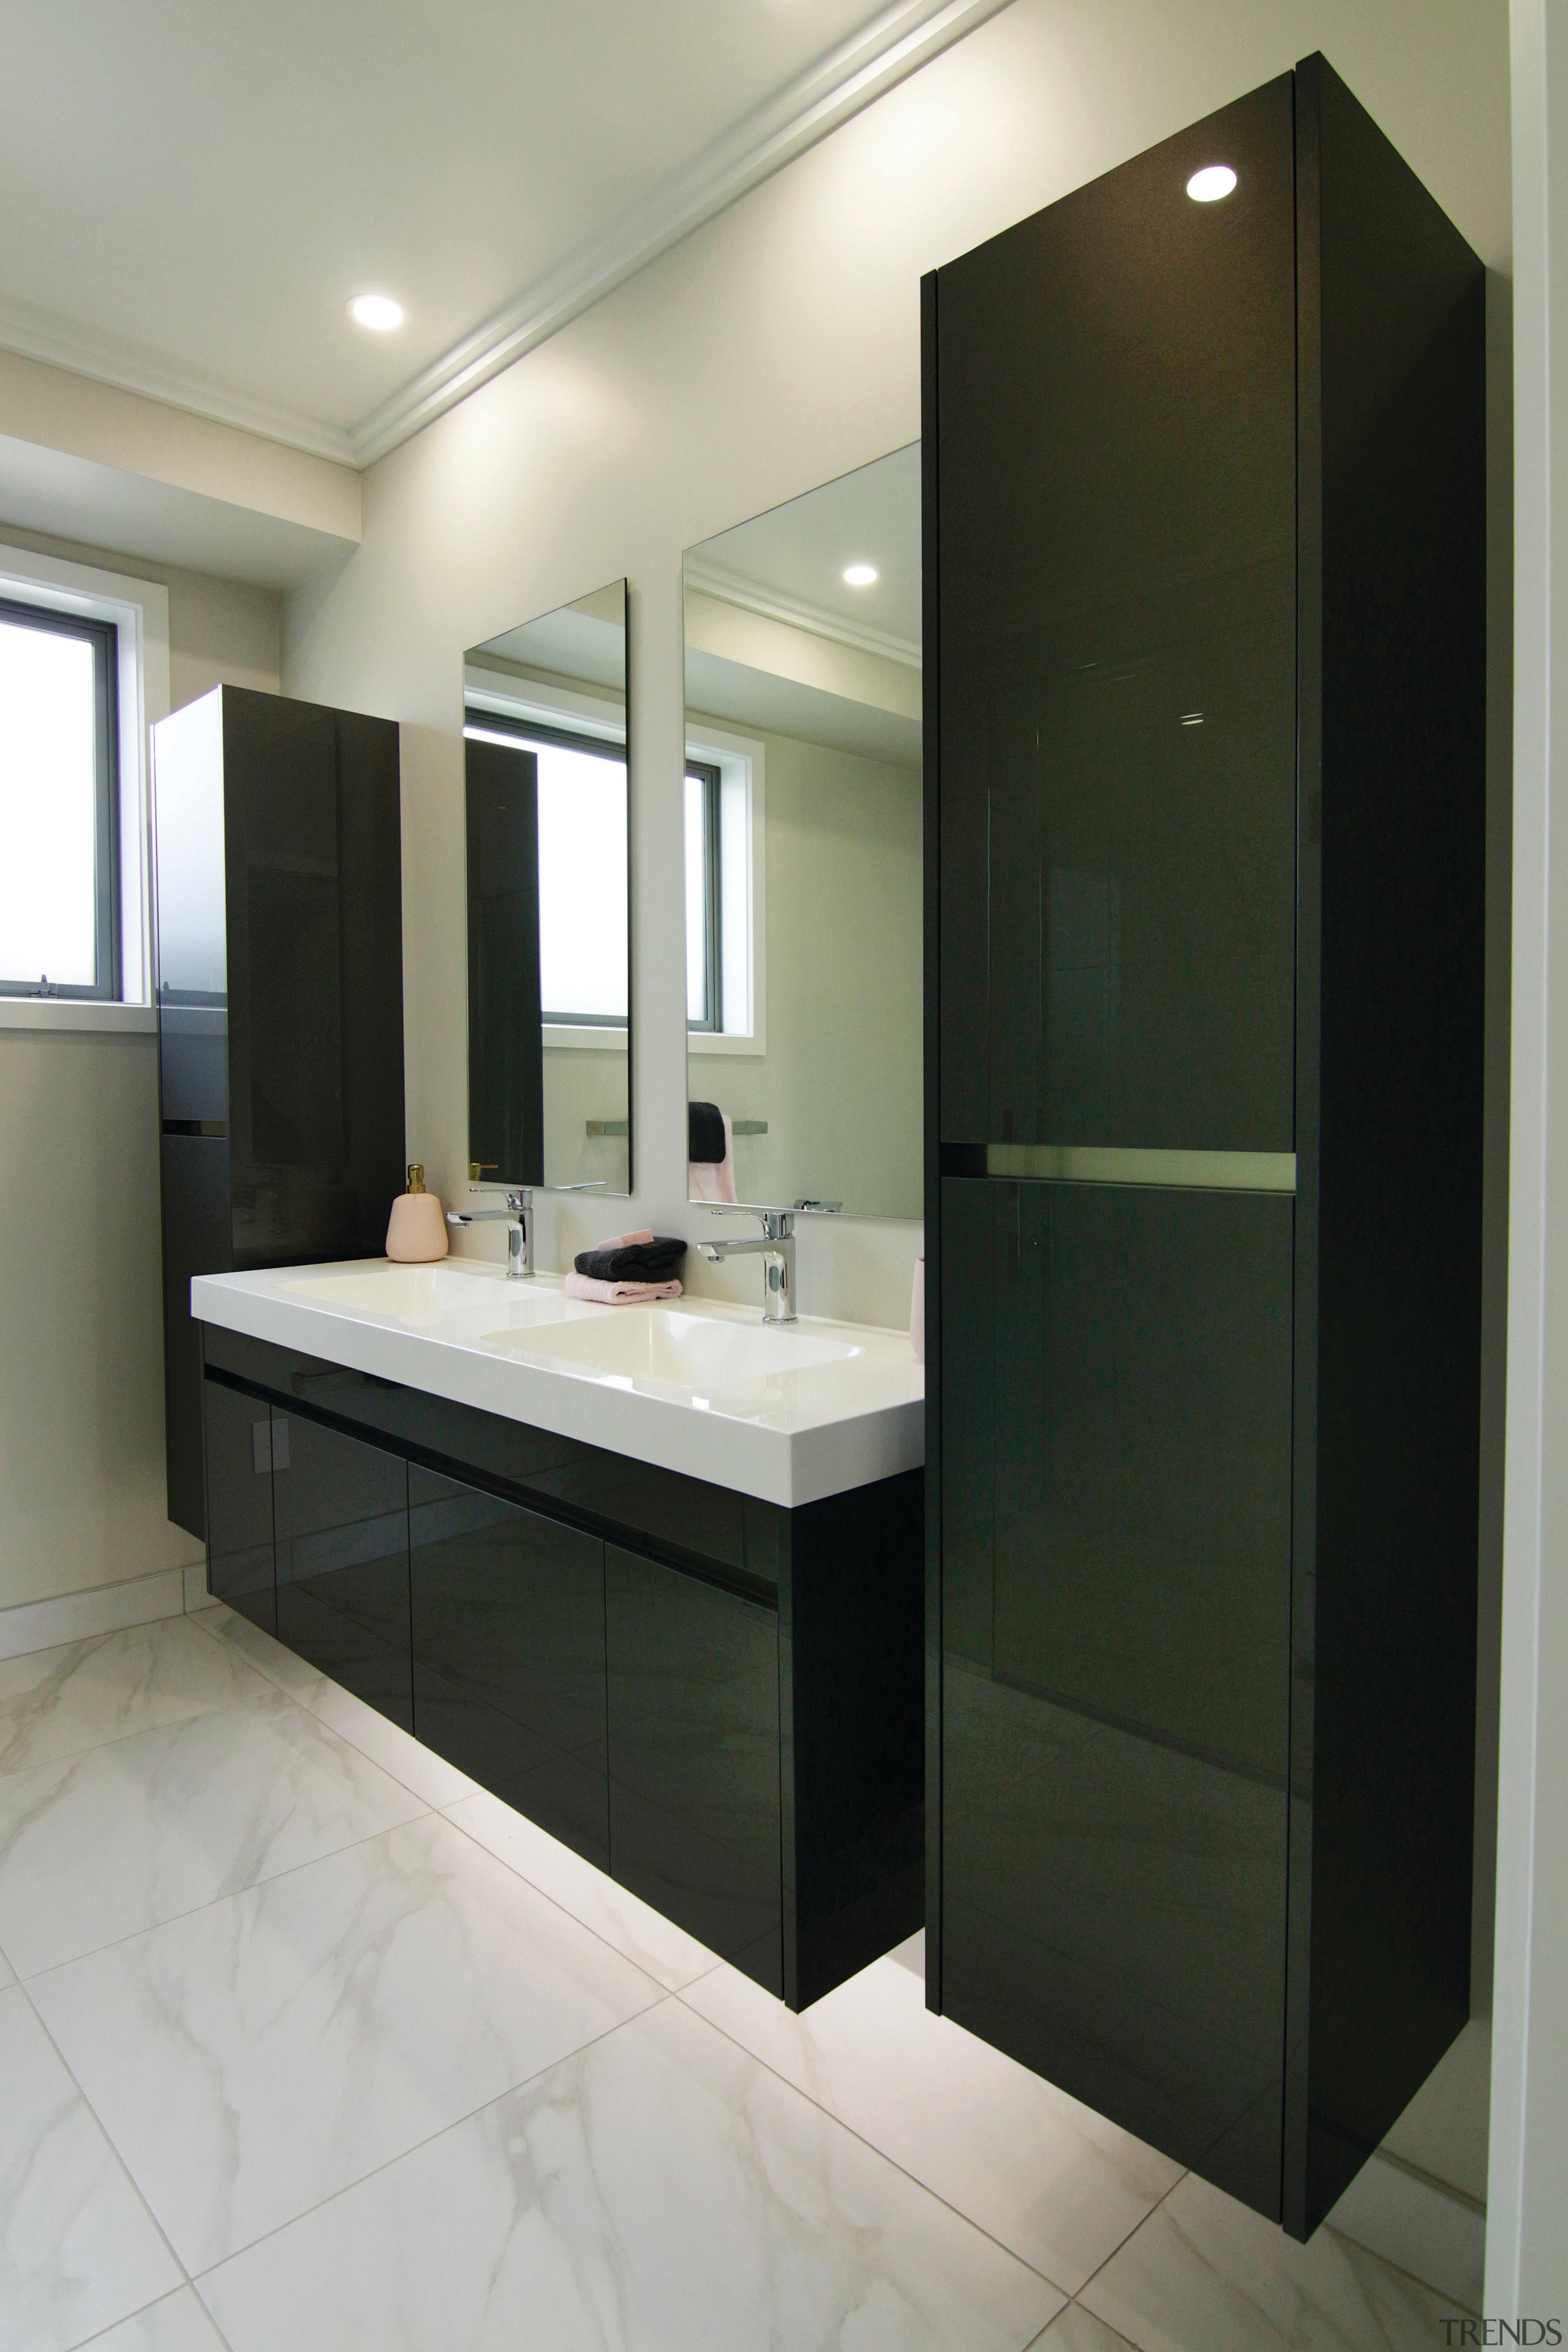 Crisp and contemporary, this bathroom forms part of bathroom, bathroom accessory, room, black, gray